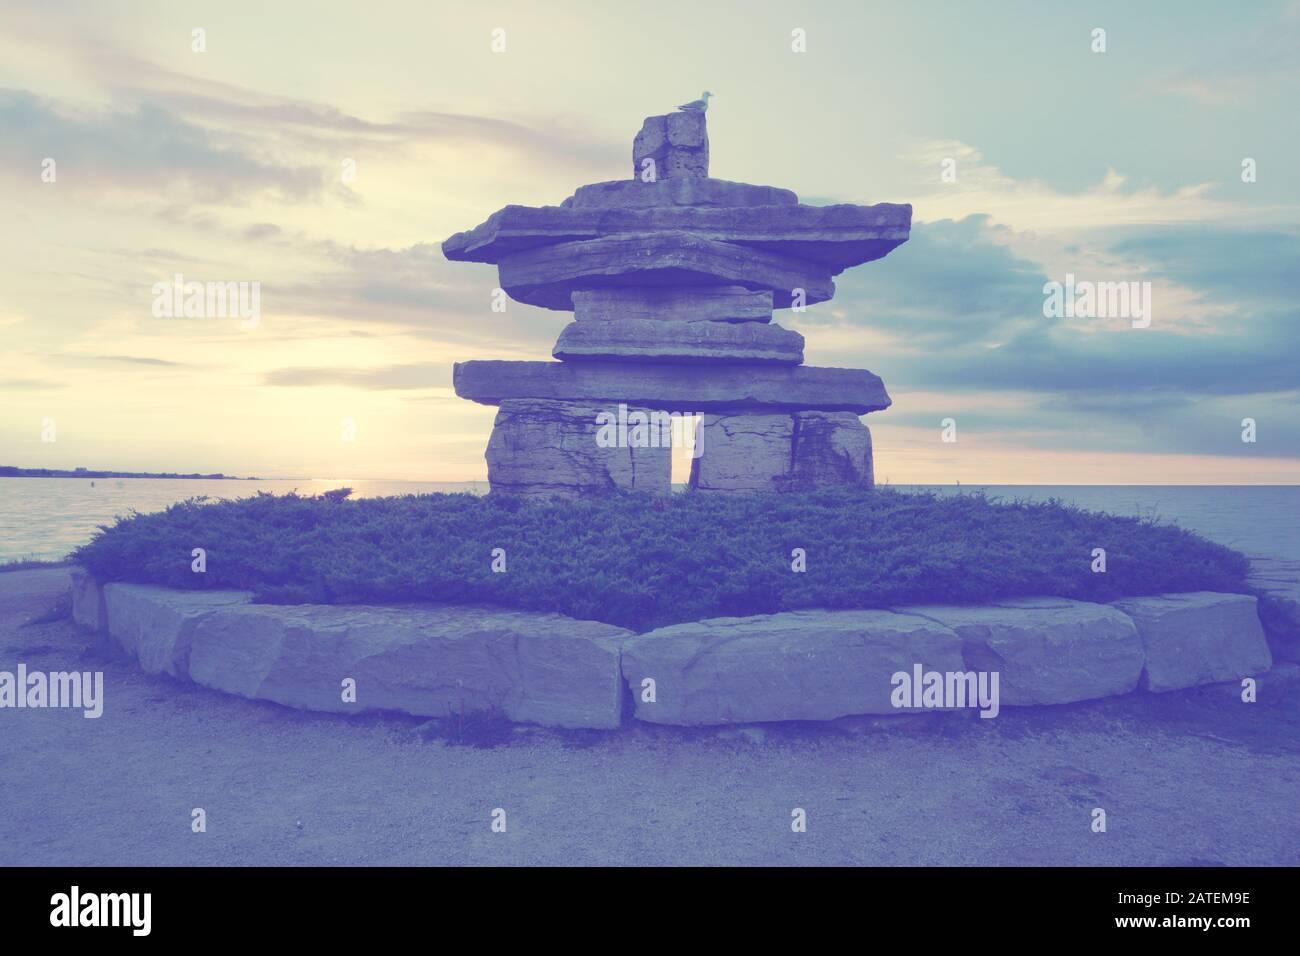 Canada Ontario Collingwood, Inukshuk at Sunset Point at Sunset Point at Sunset, Juni 2019, Inushuk Stone Landmark, We were Here, Pastell Tone Stockfoto